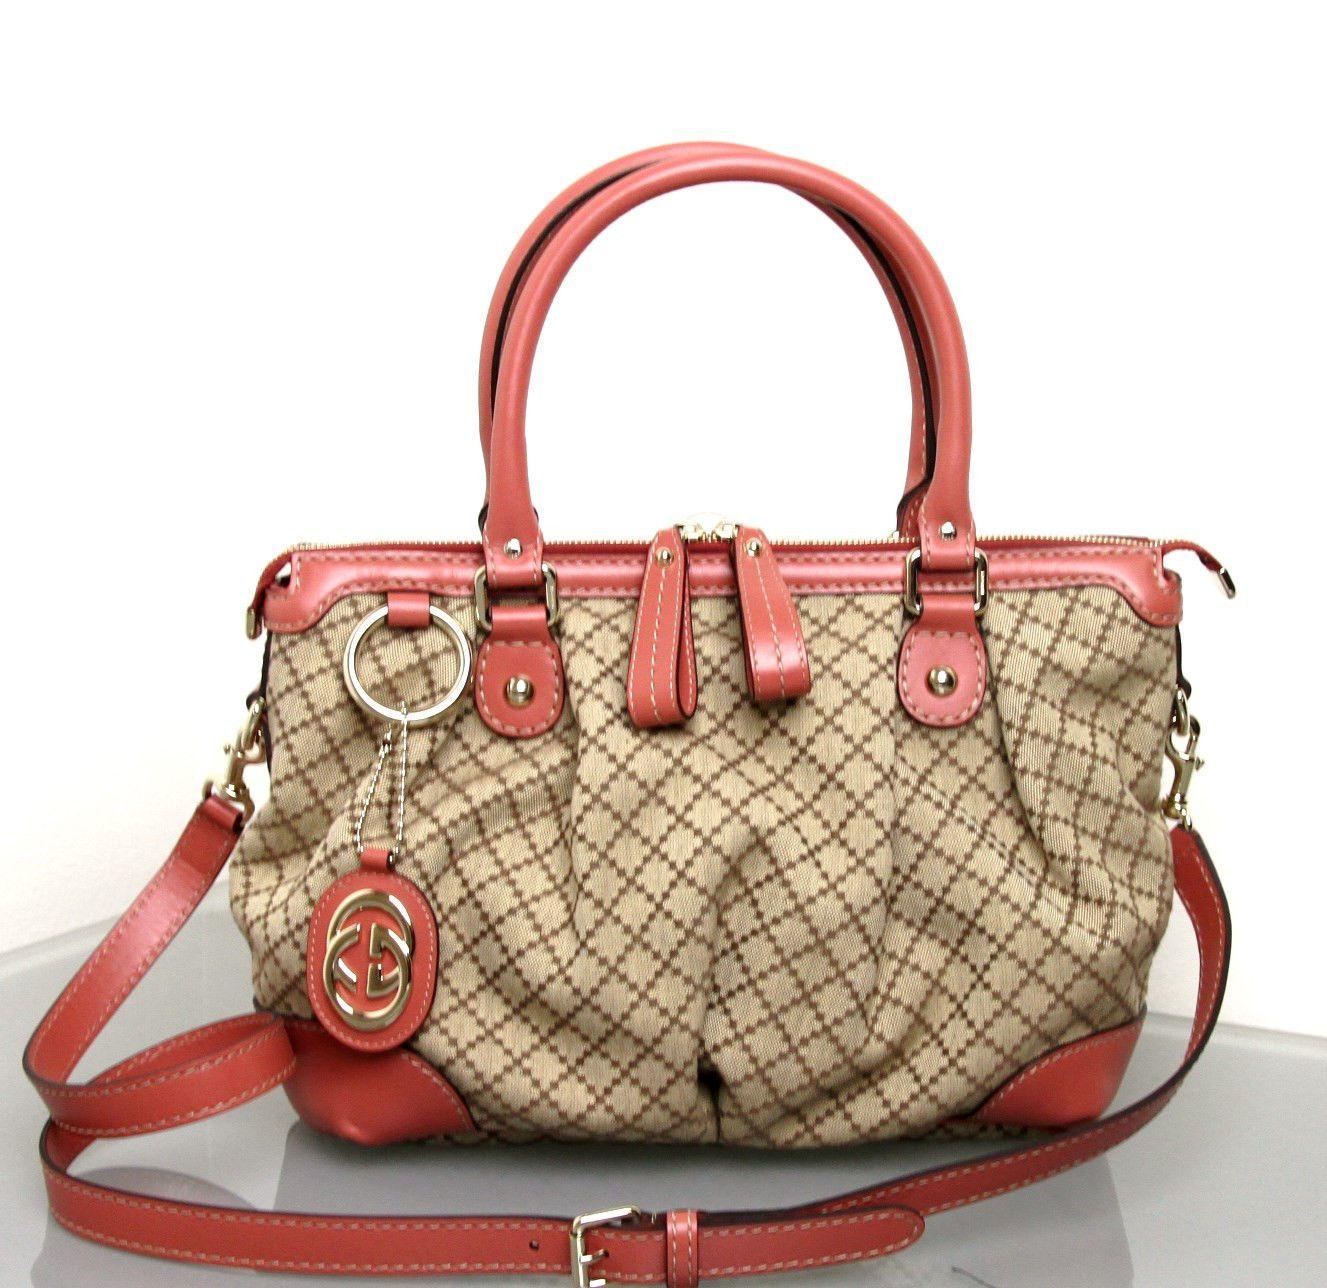 bab021eacaab NEW Authentic Gucci Sukey Diamante Canvas Tote Messenger Bag Handbag 247902